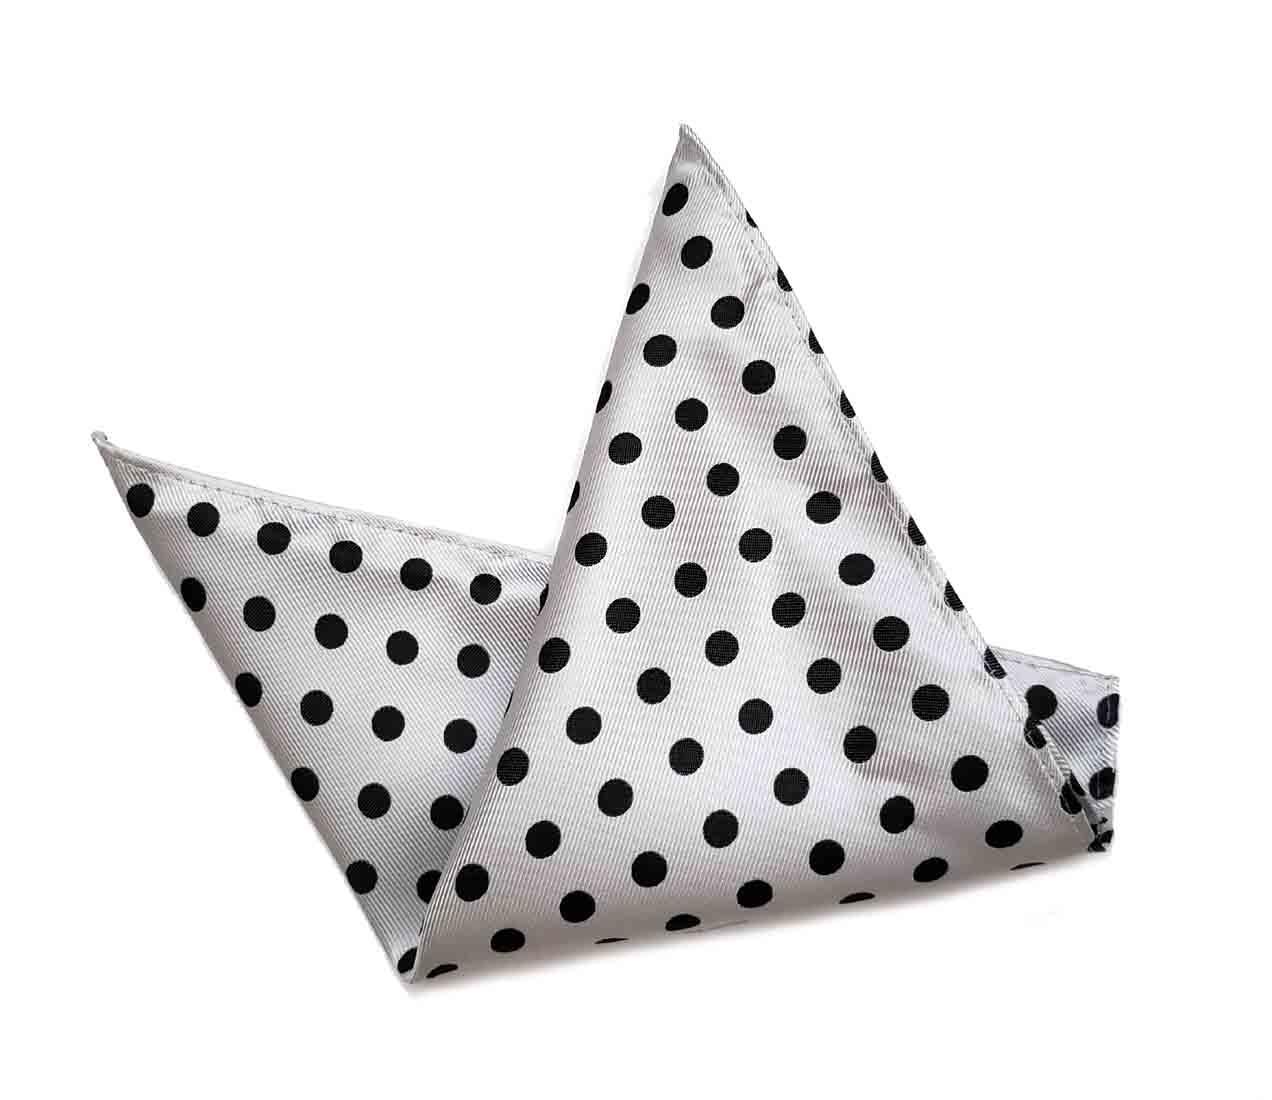 ekSel Pocket Square White Gray Polka Dot Men's